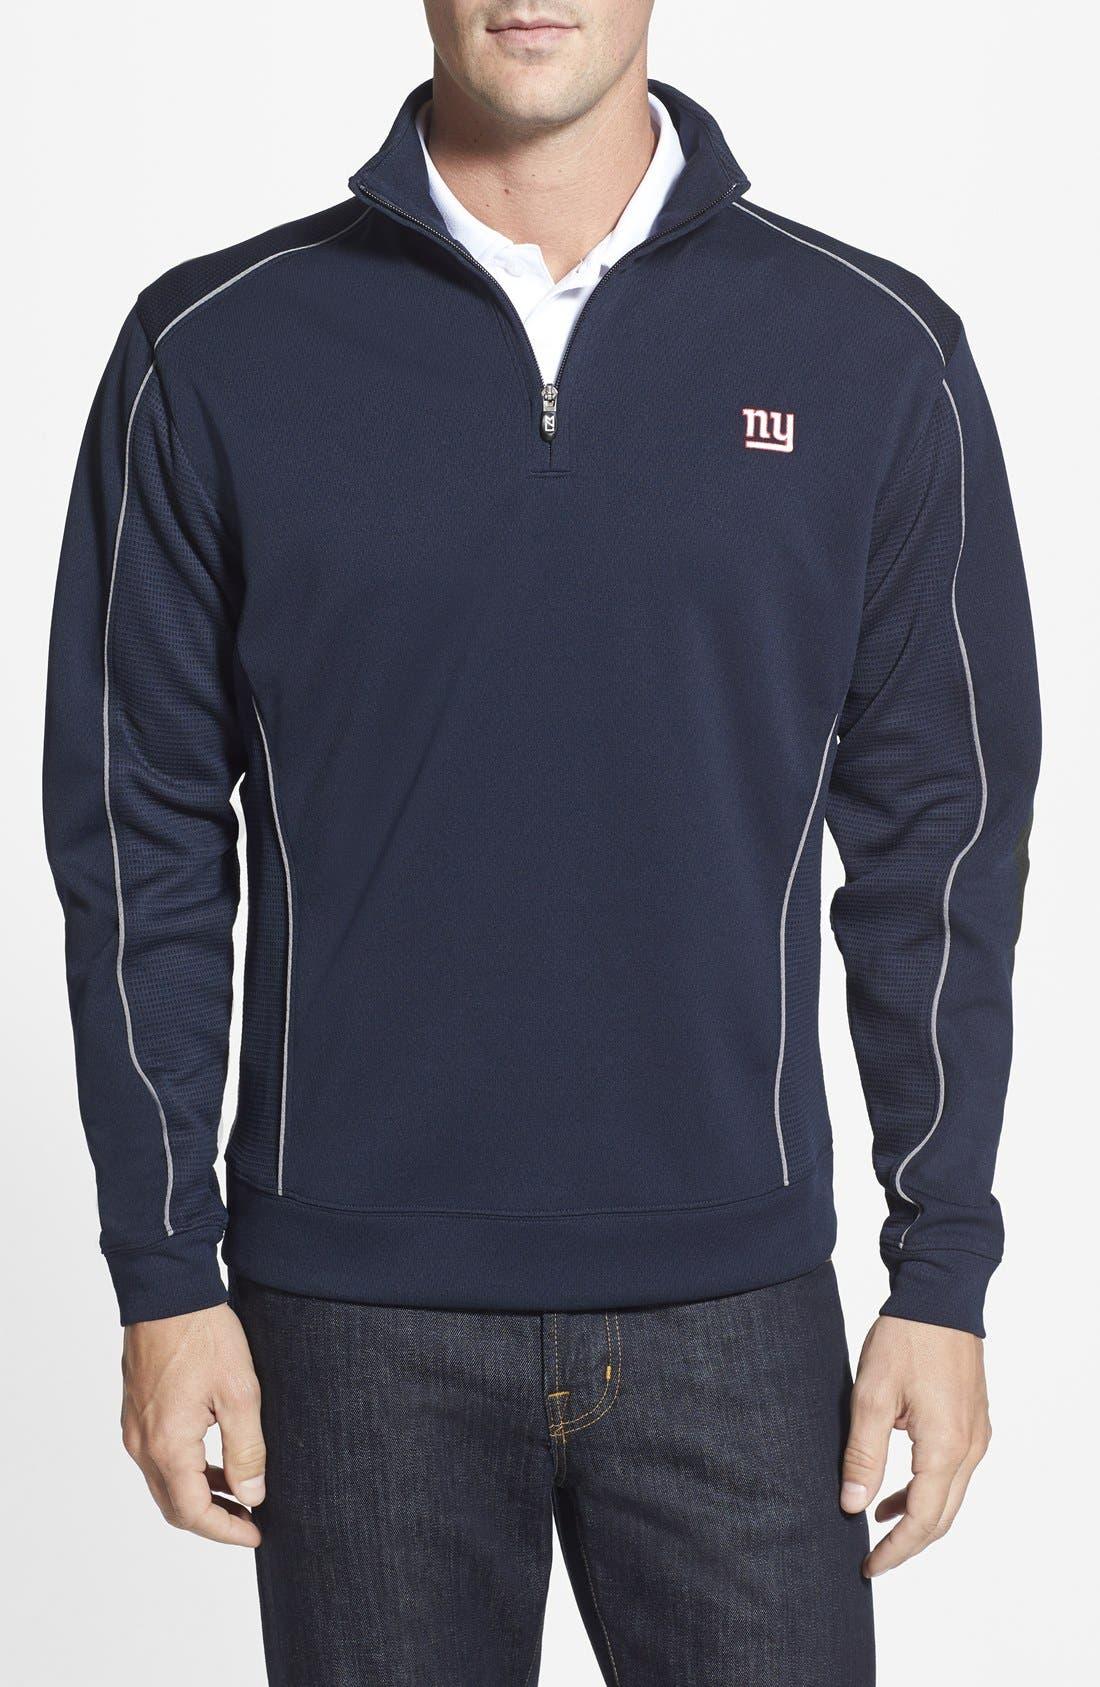 New York Giants - Edge DryTec Moisture Wicking Half Zip Pullover,                         Main,                         color, Navy Blue